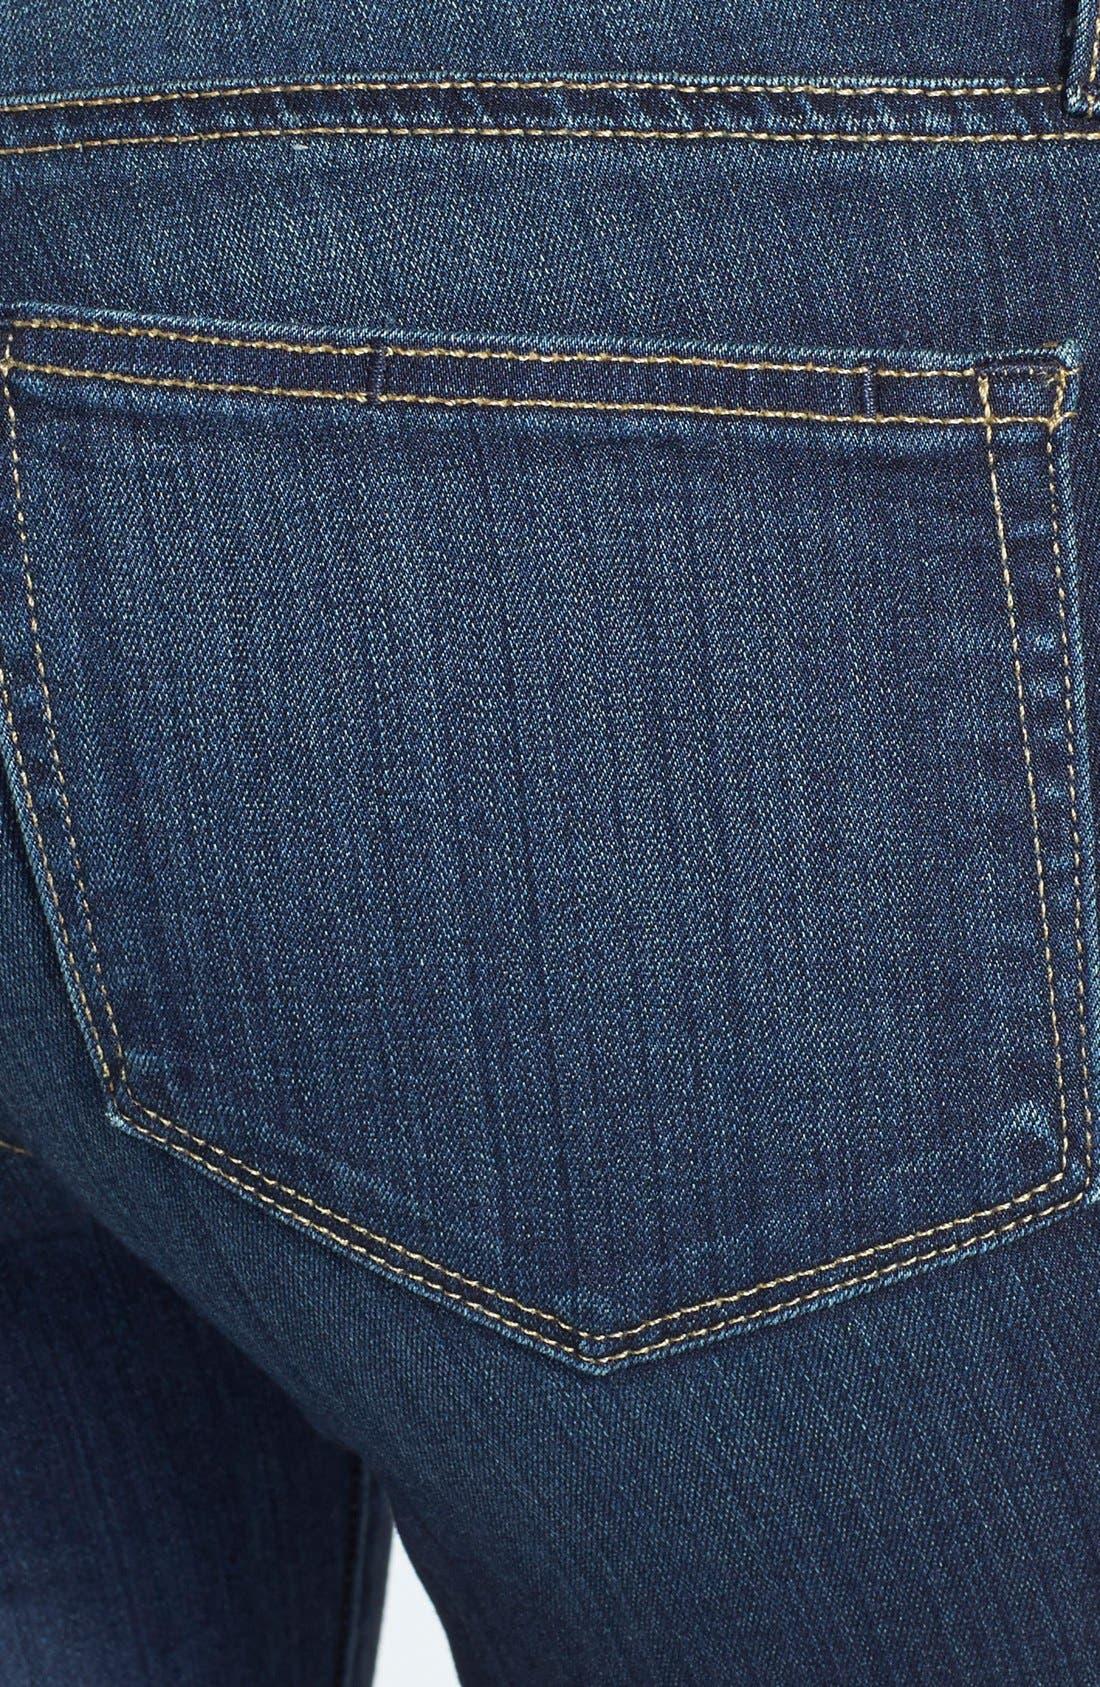 Alternate Image 3  - Paige Denim 'Transcend - Verdugo' Maternity Jeans (Nottingham)